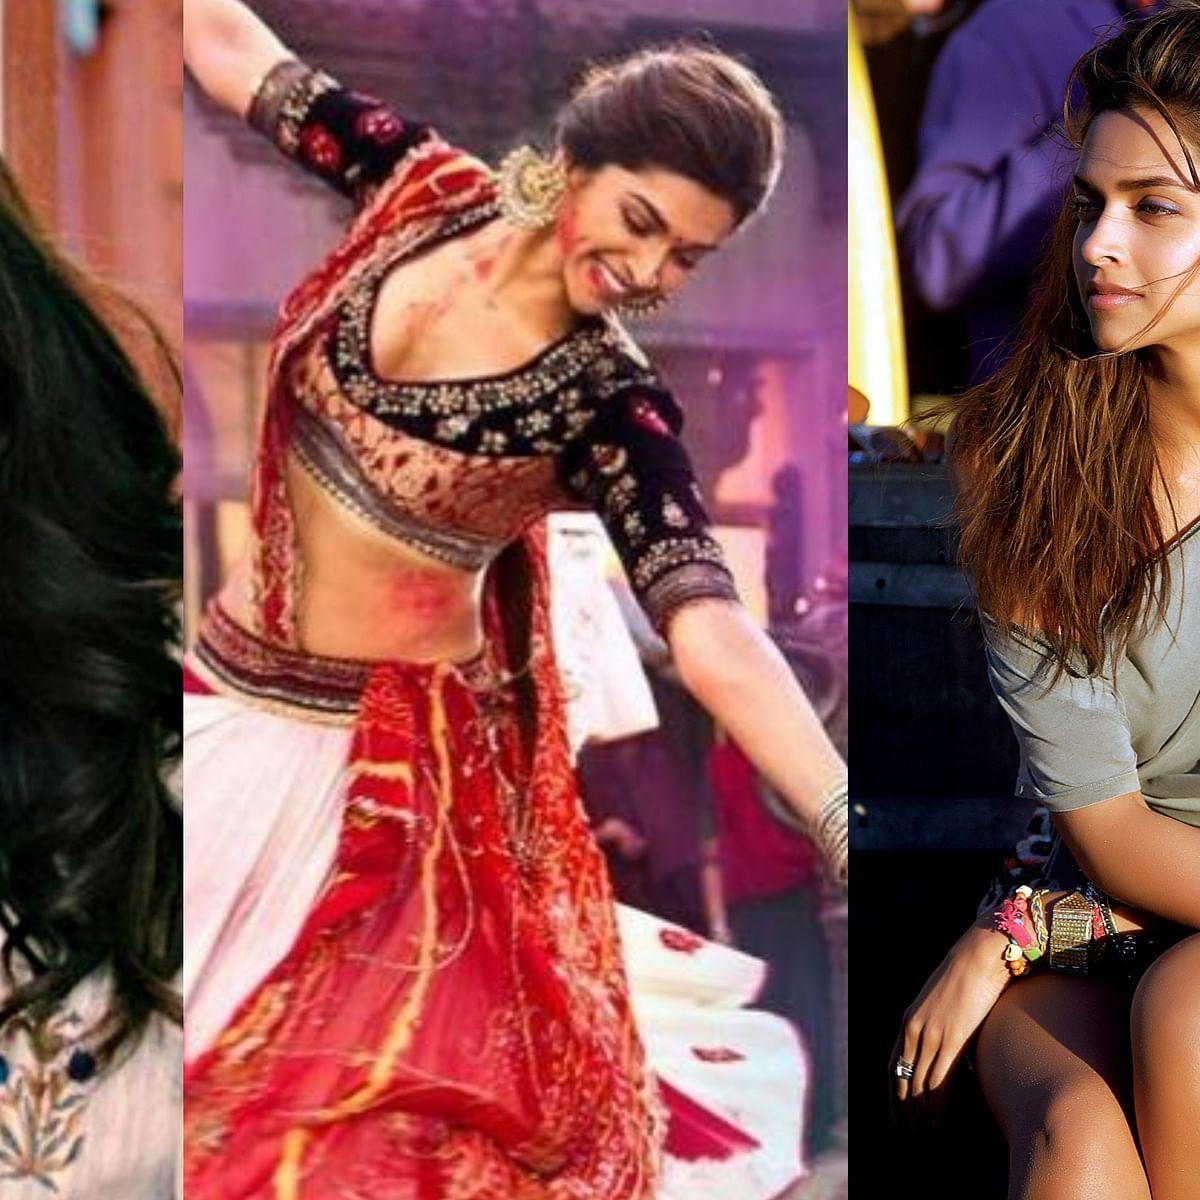 From Veronica to Piku, Deepika Padukone's 5 memorable characters